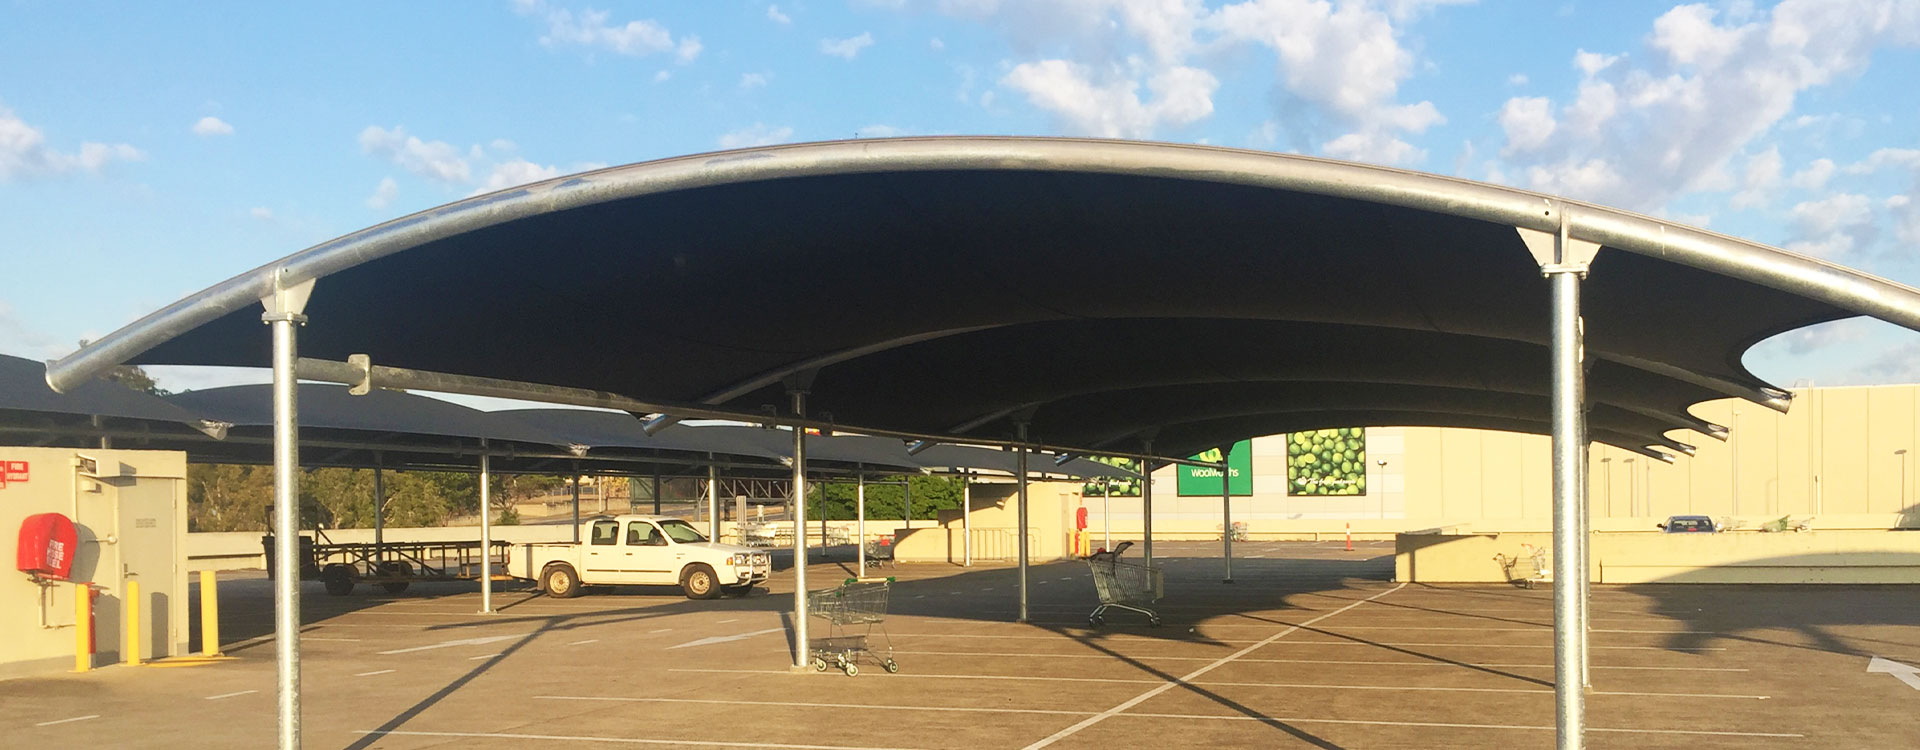 Sunnybank Hills Rooftop Carpark